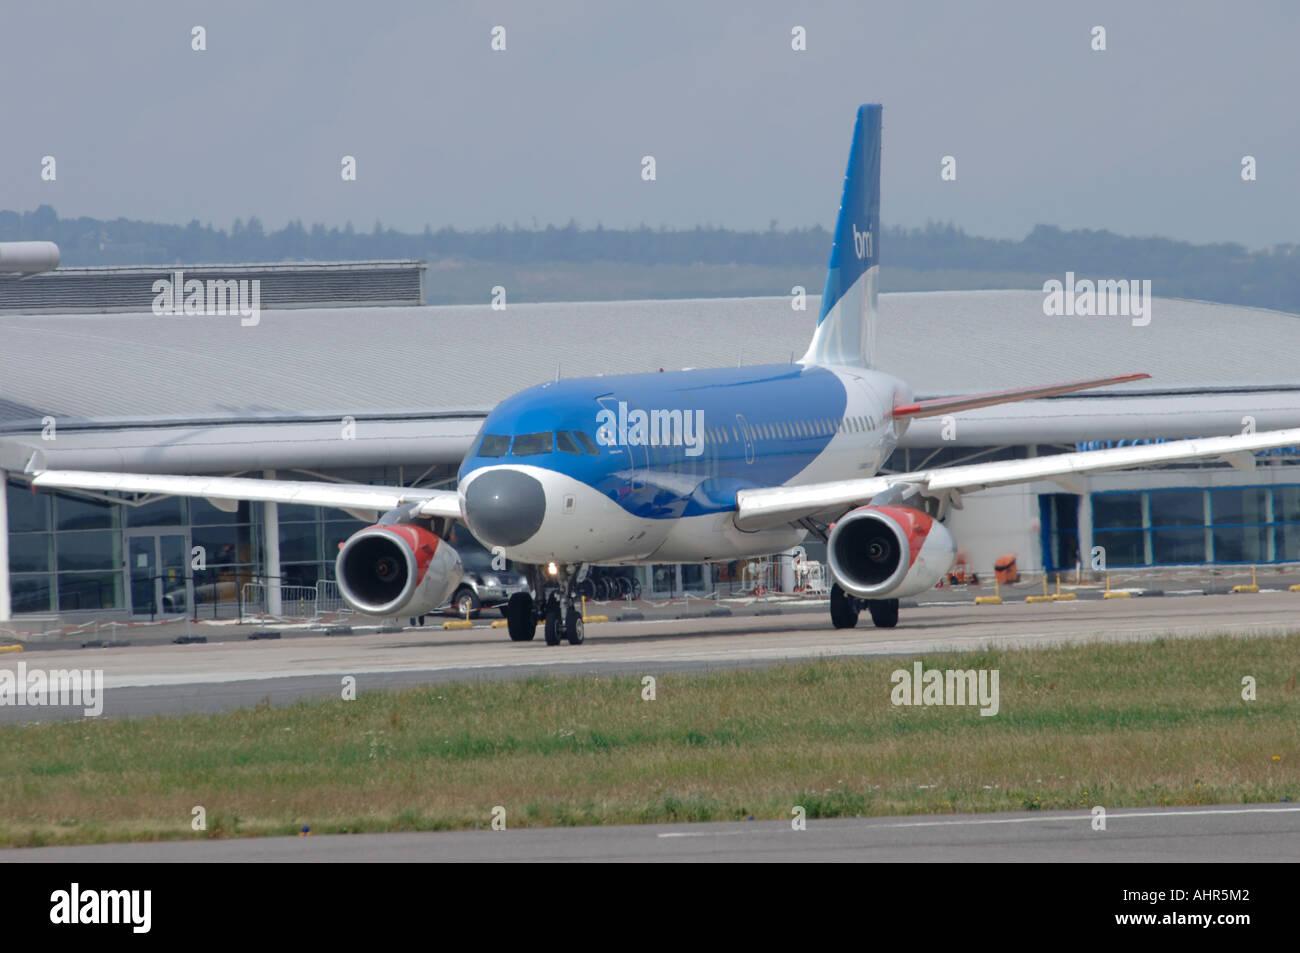 British Midland Boeing Airbus 319 Civil Passenger Airliner. Registration G-DBCD Inverness Airport.   XAV 1250-301 - Stock Image